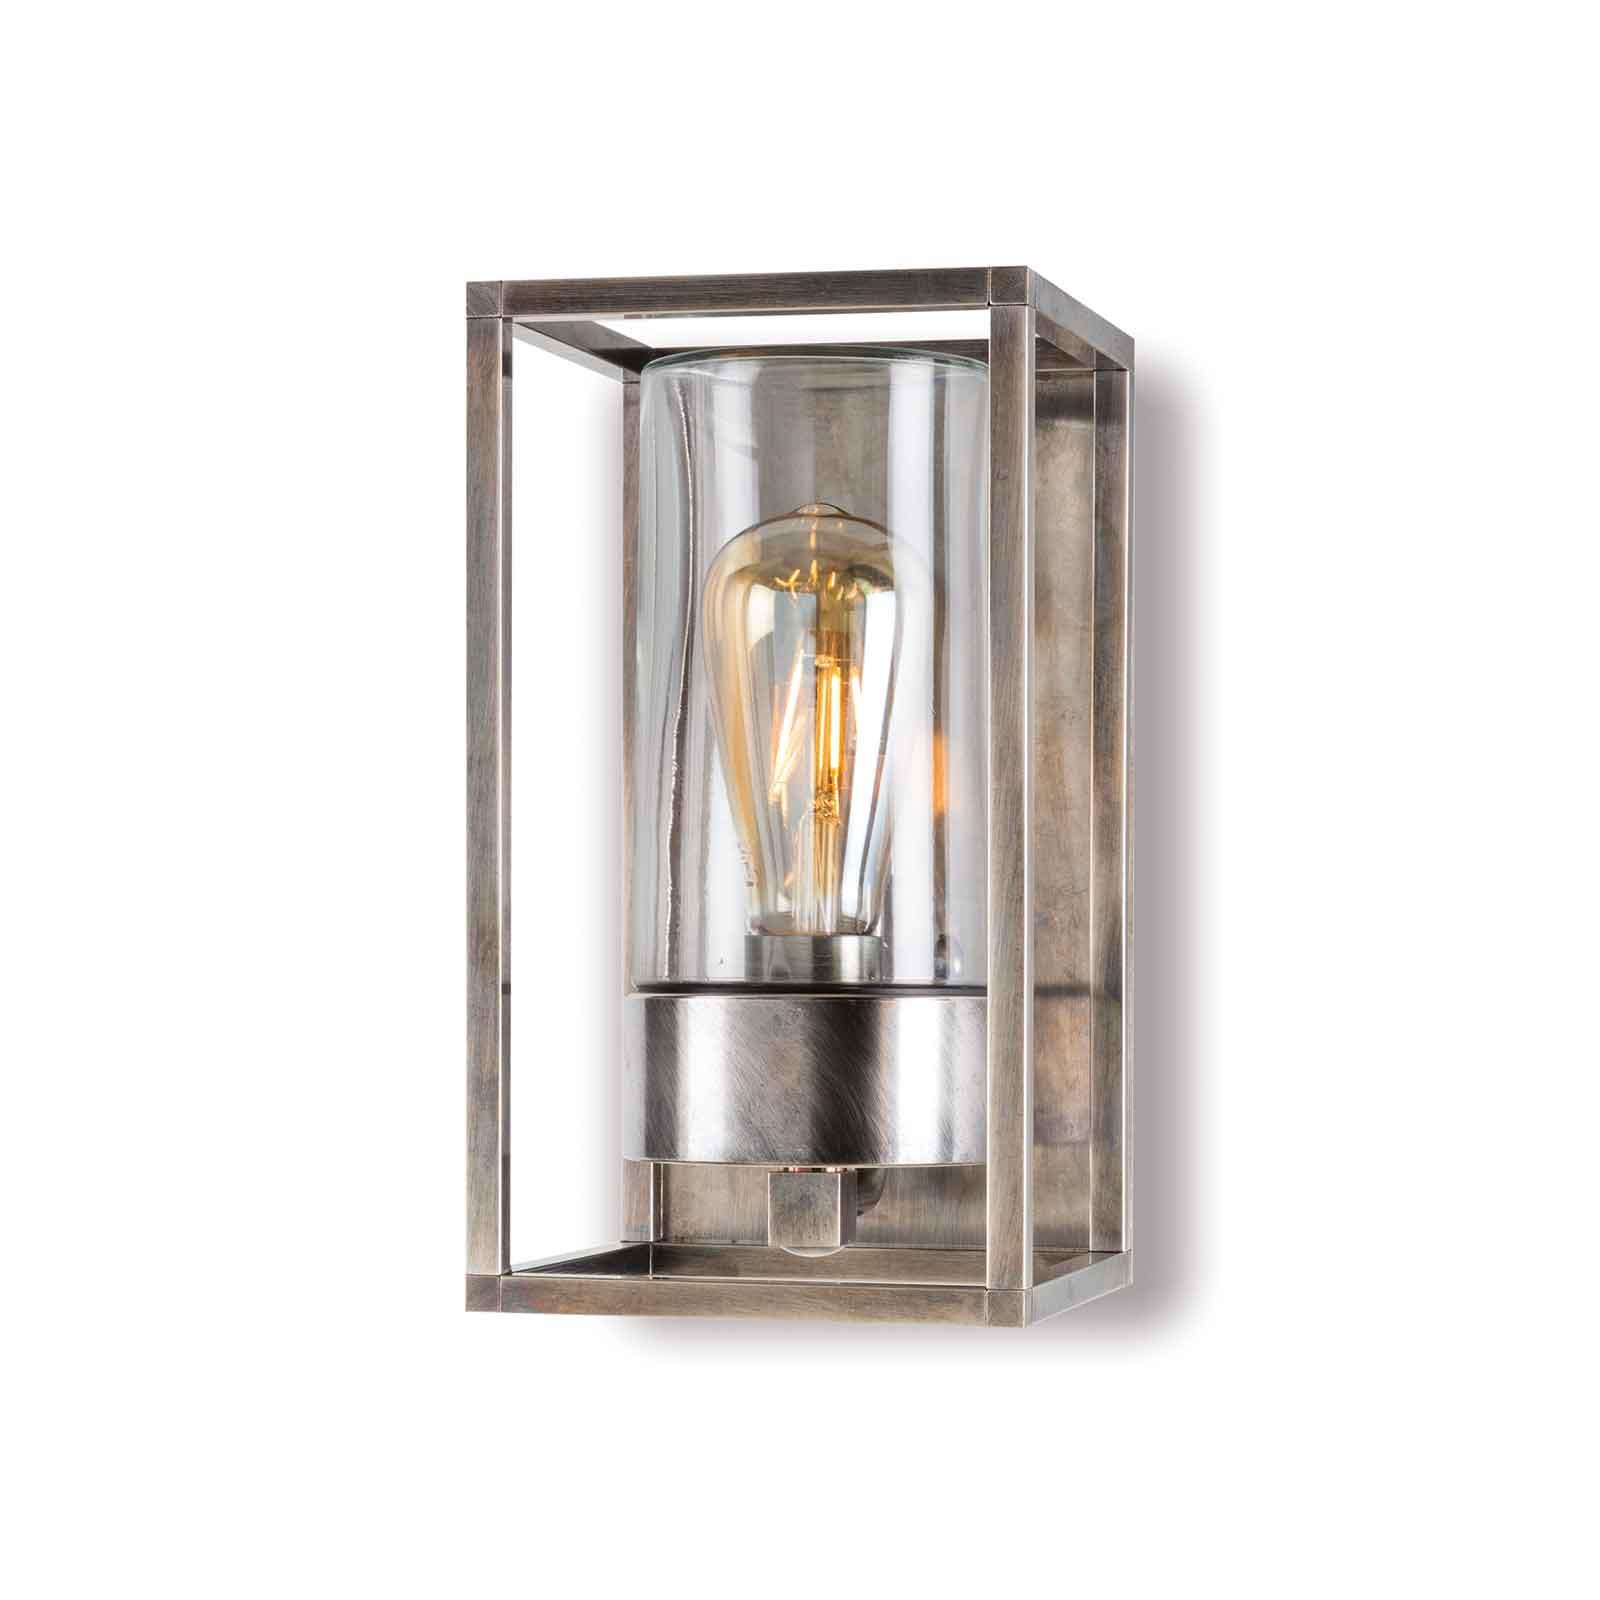 Buitenwandlamp Cubic³ 3365, nikkel antiek/helder